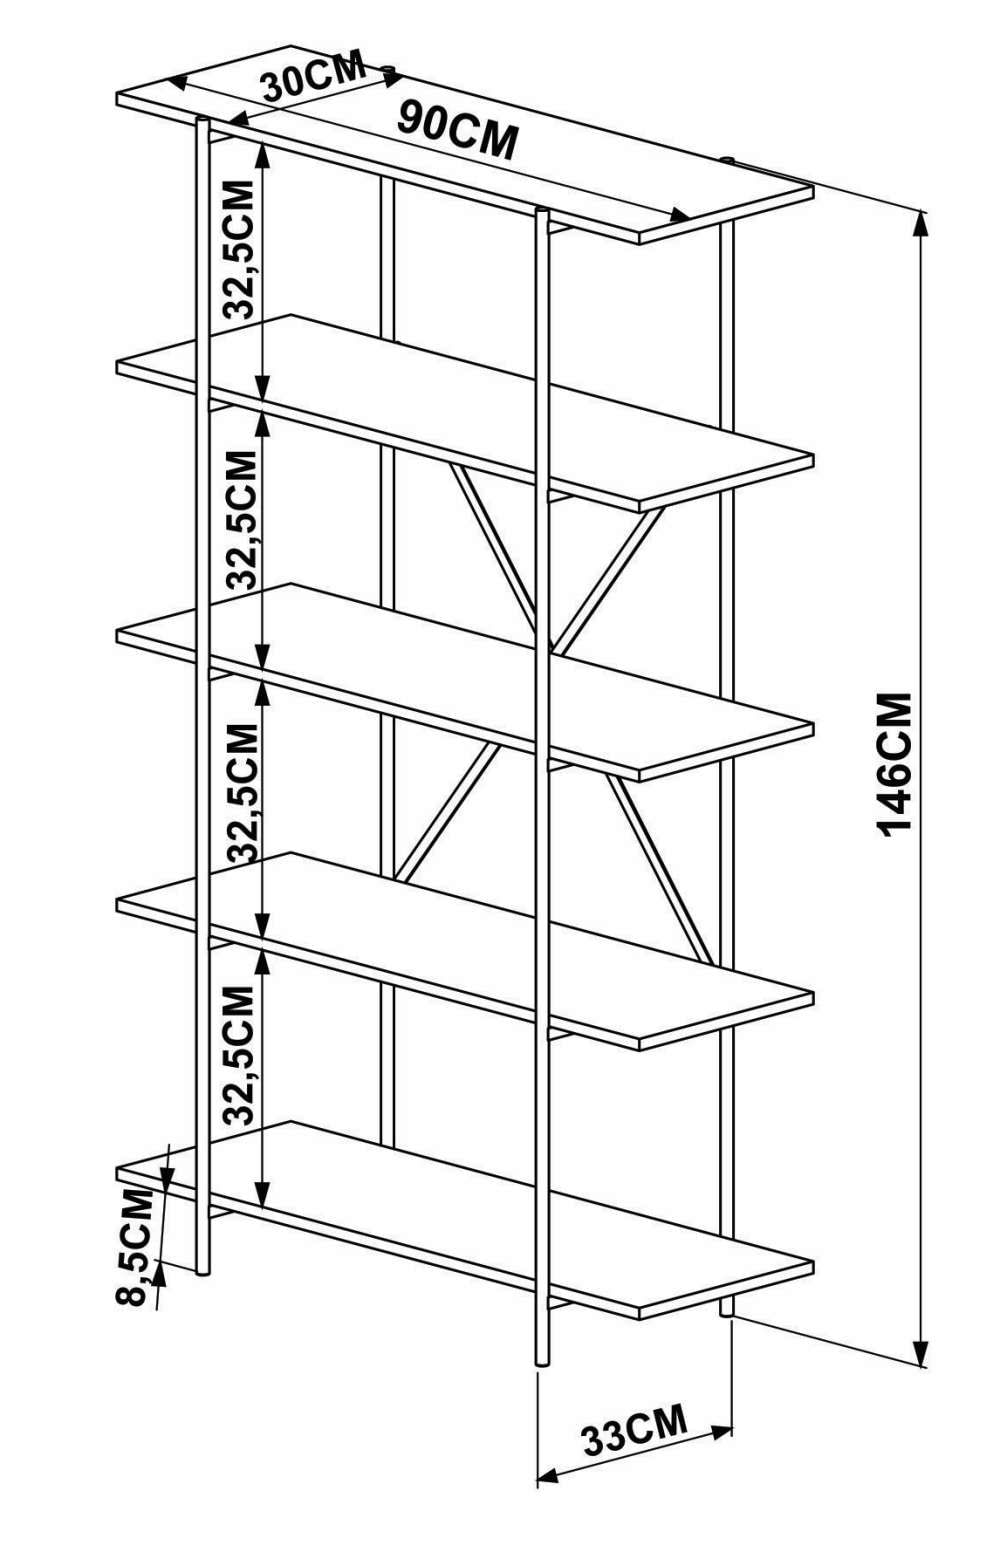 Estante Kea 5 Prateleiras Cor Vermont Estrutura Preto Fosco 90cm (Larg) - 56394